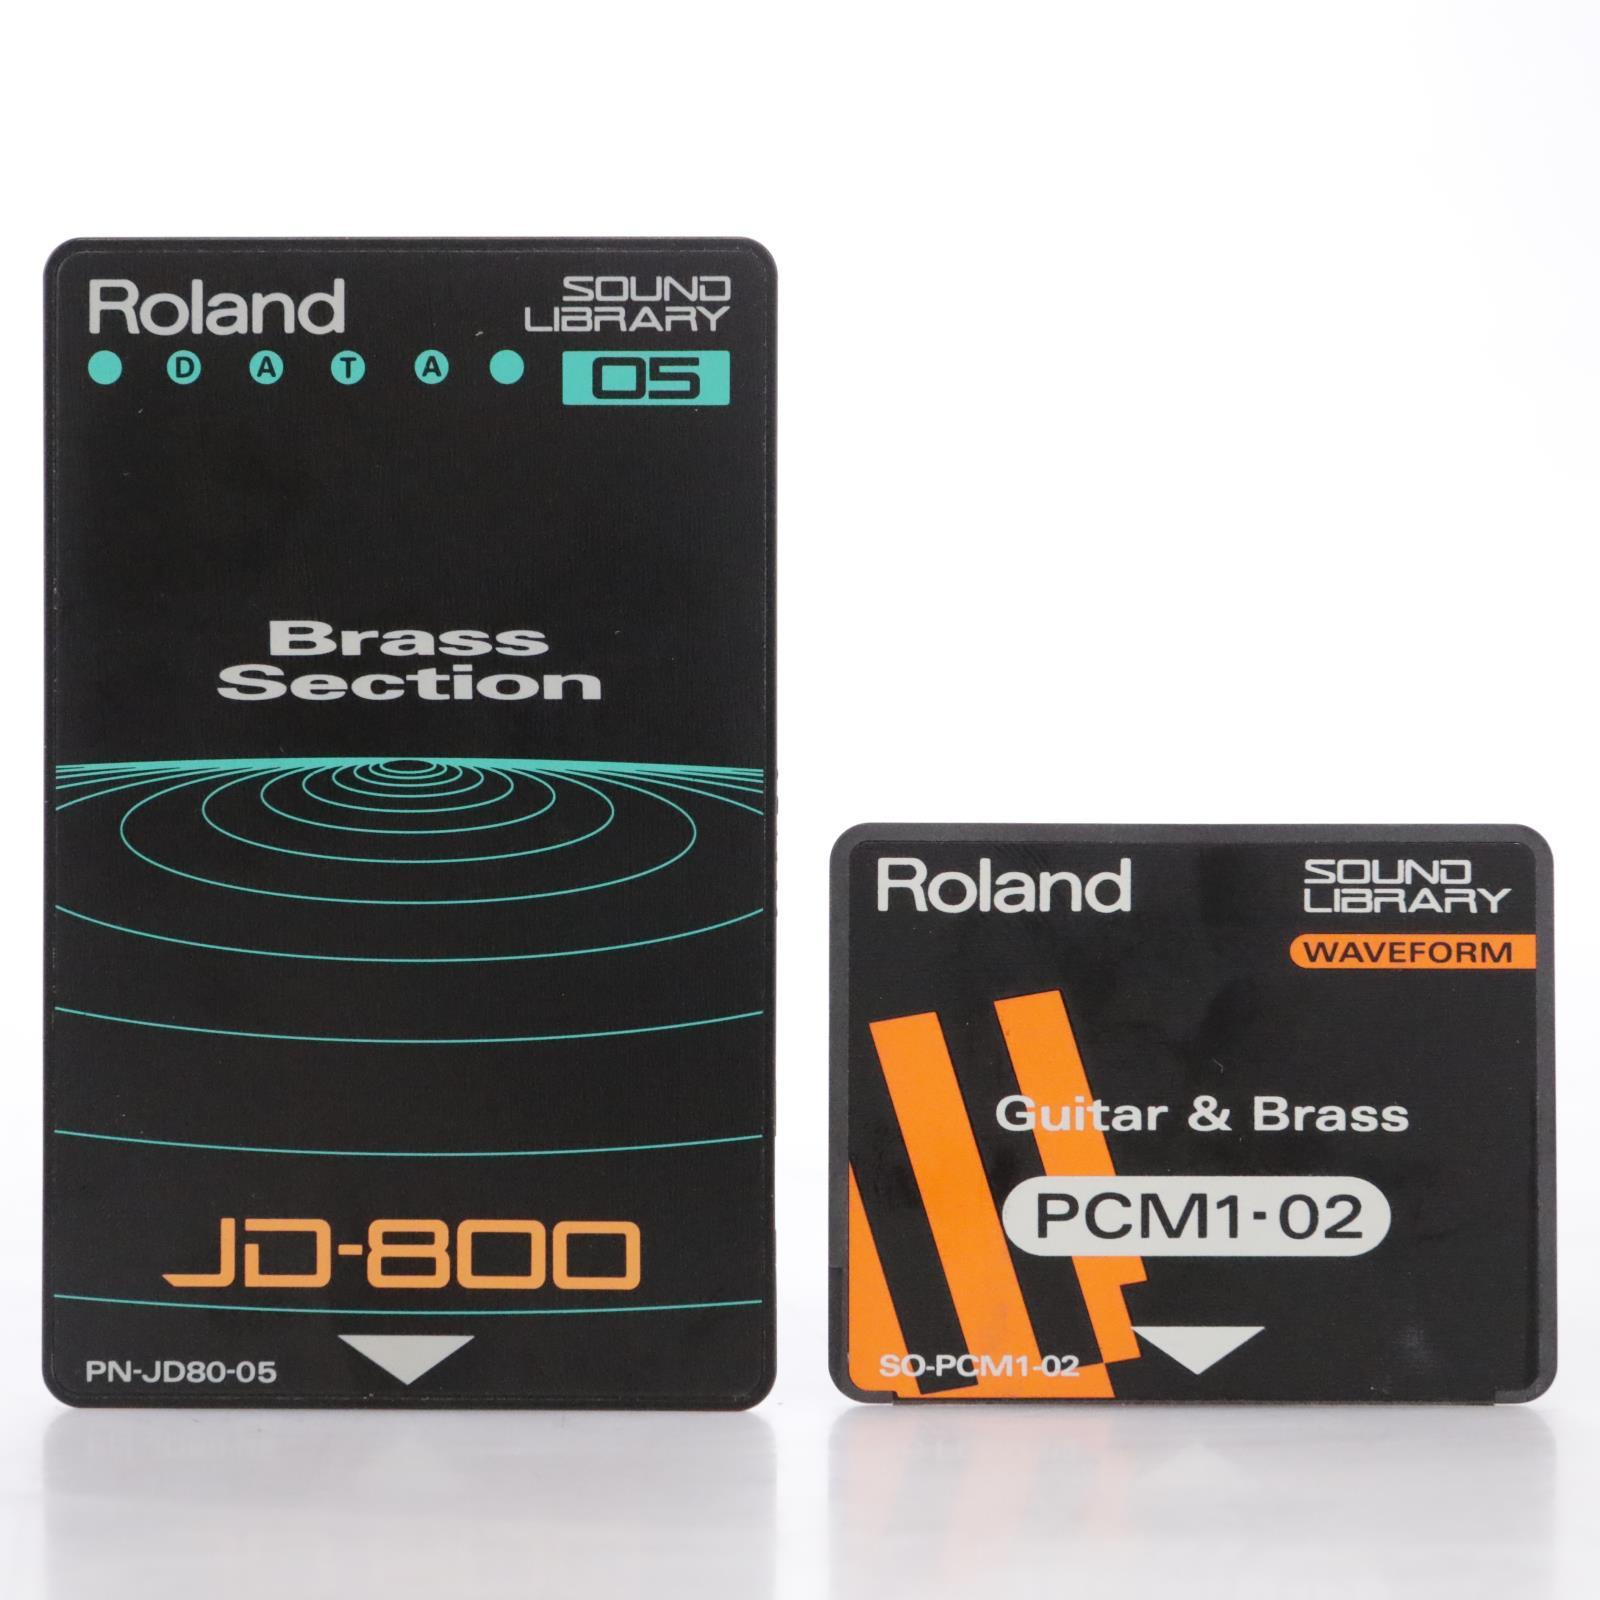 Roland PN-JD80-05 Brass Data & PCM1-02 Guitar Wave Cards Roland JD-800 #44236